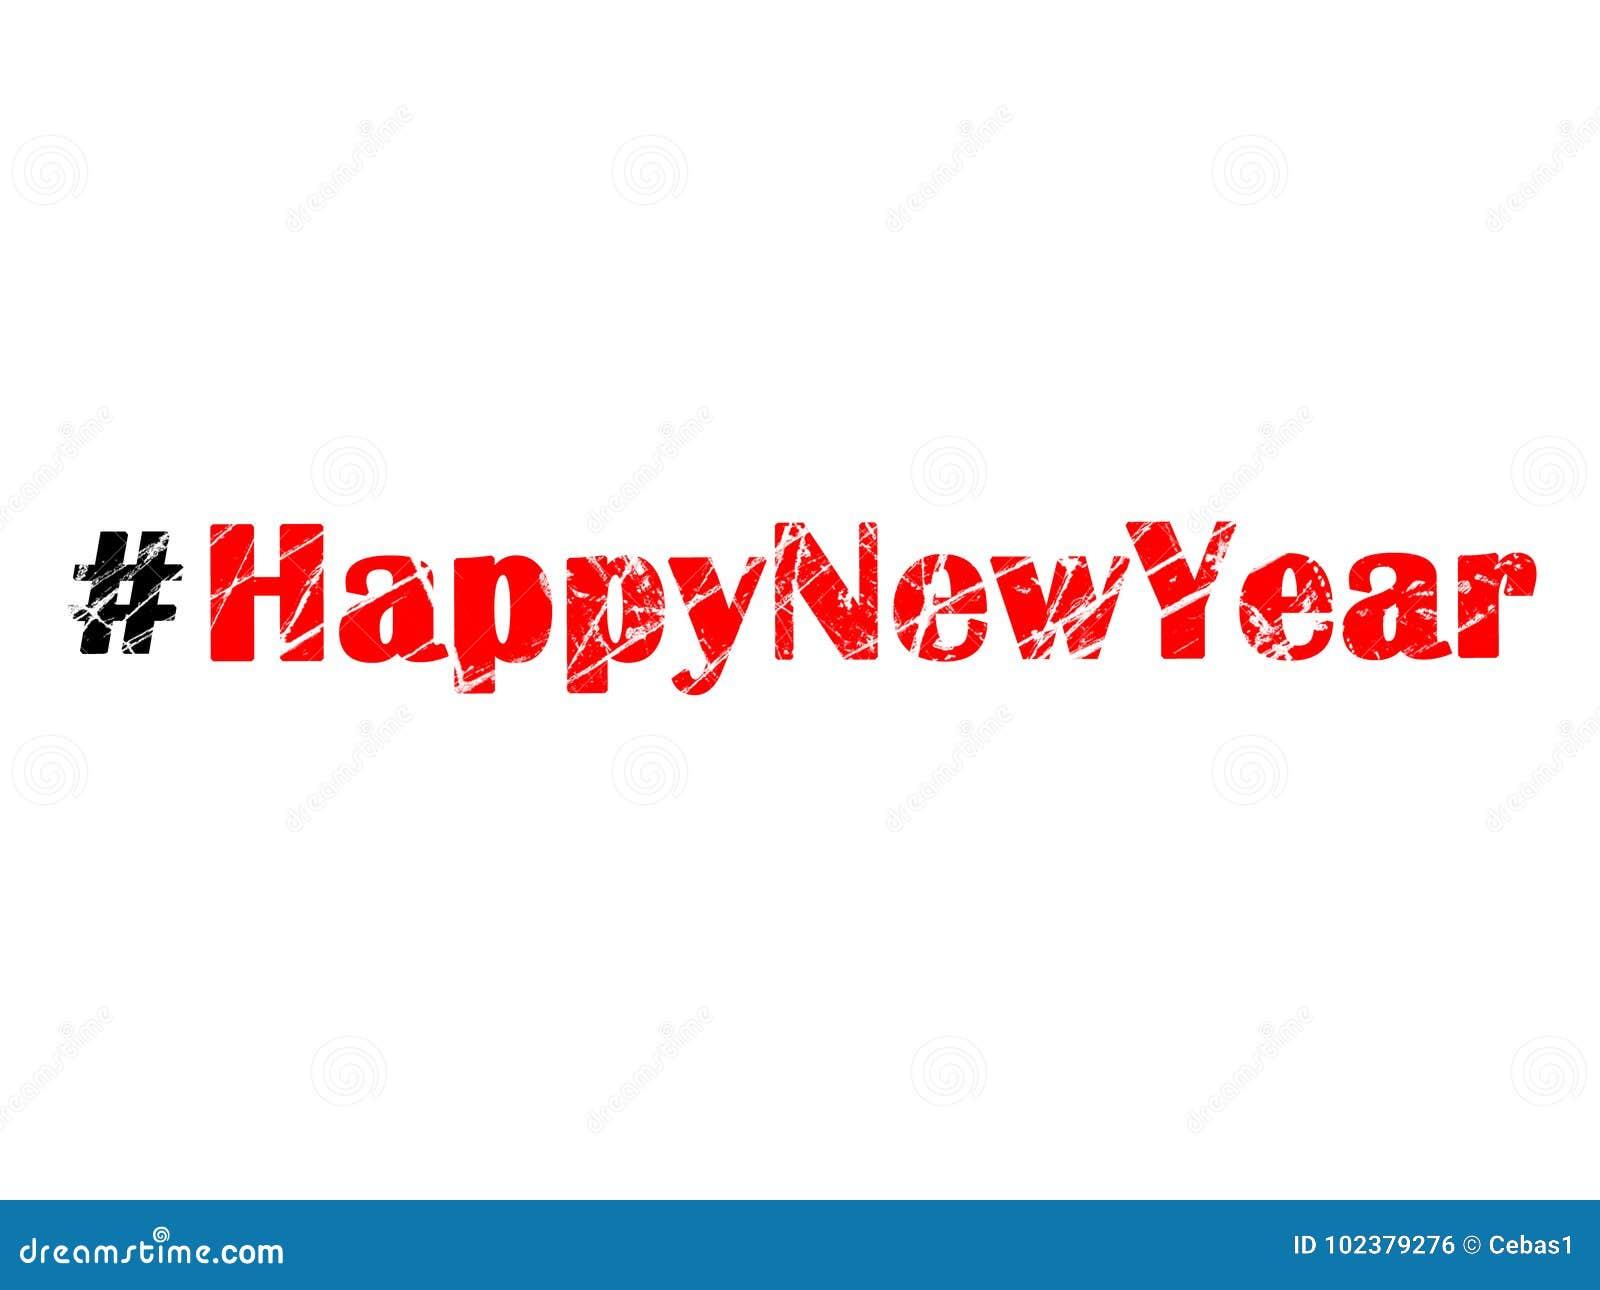 hashtag happy new year on white background